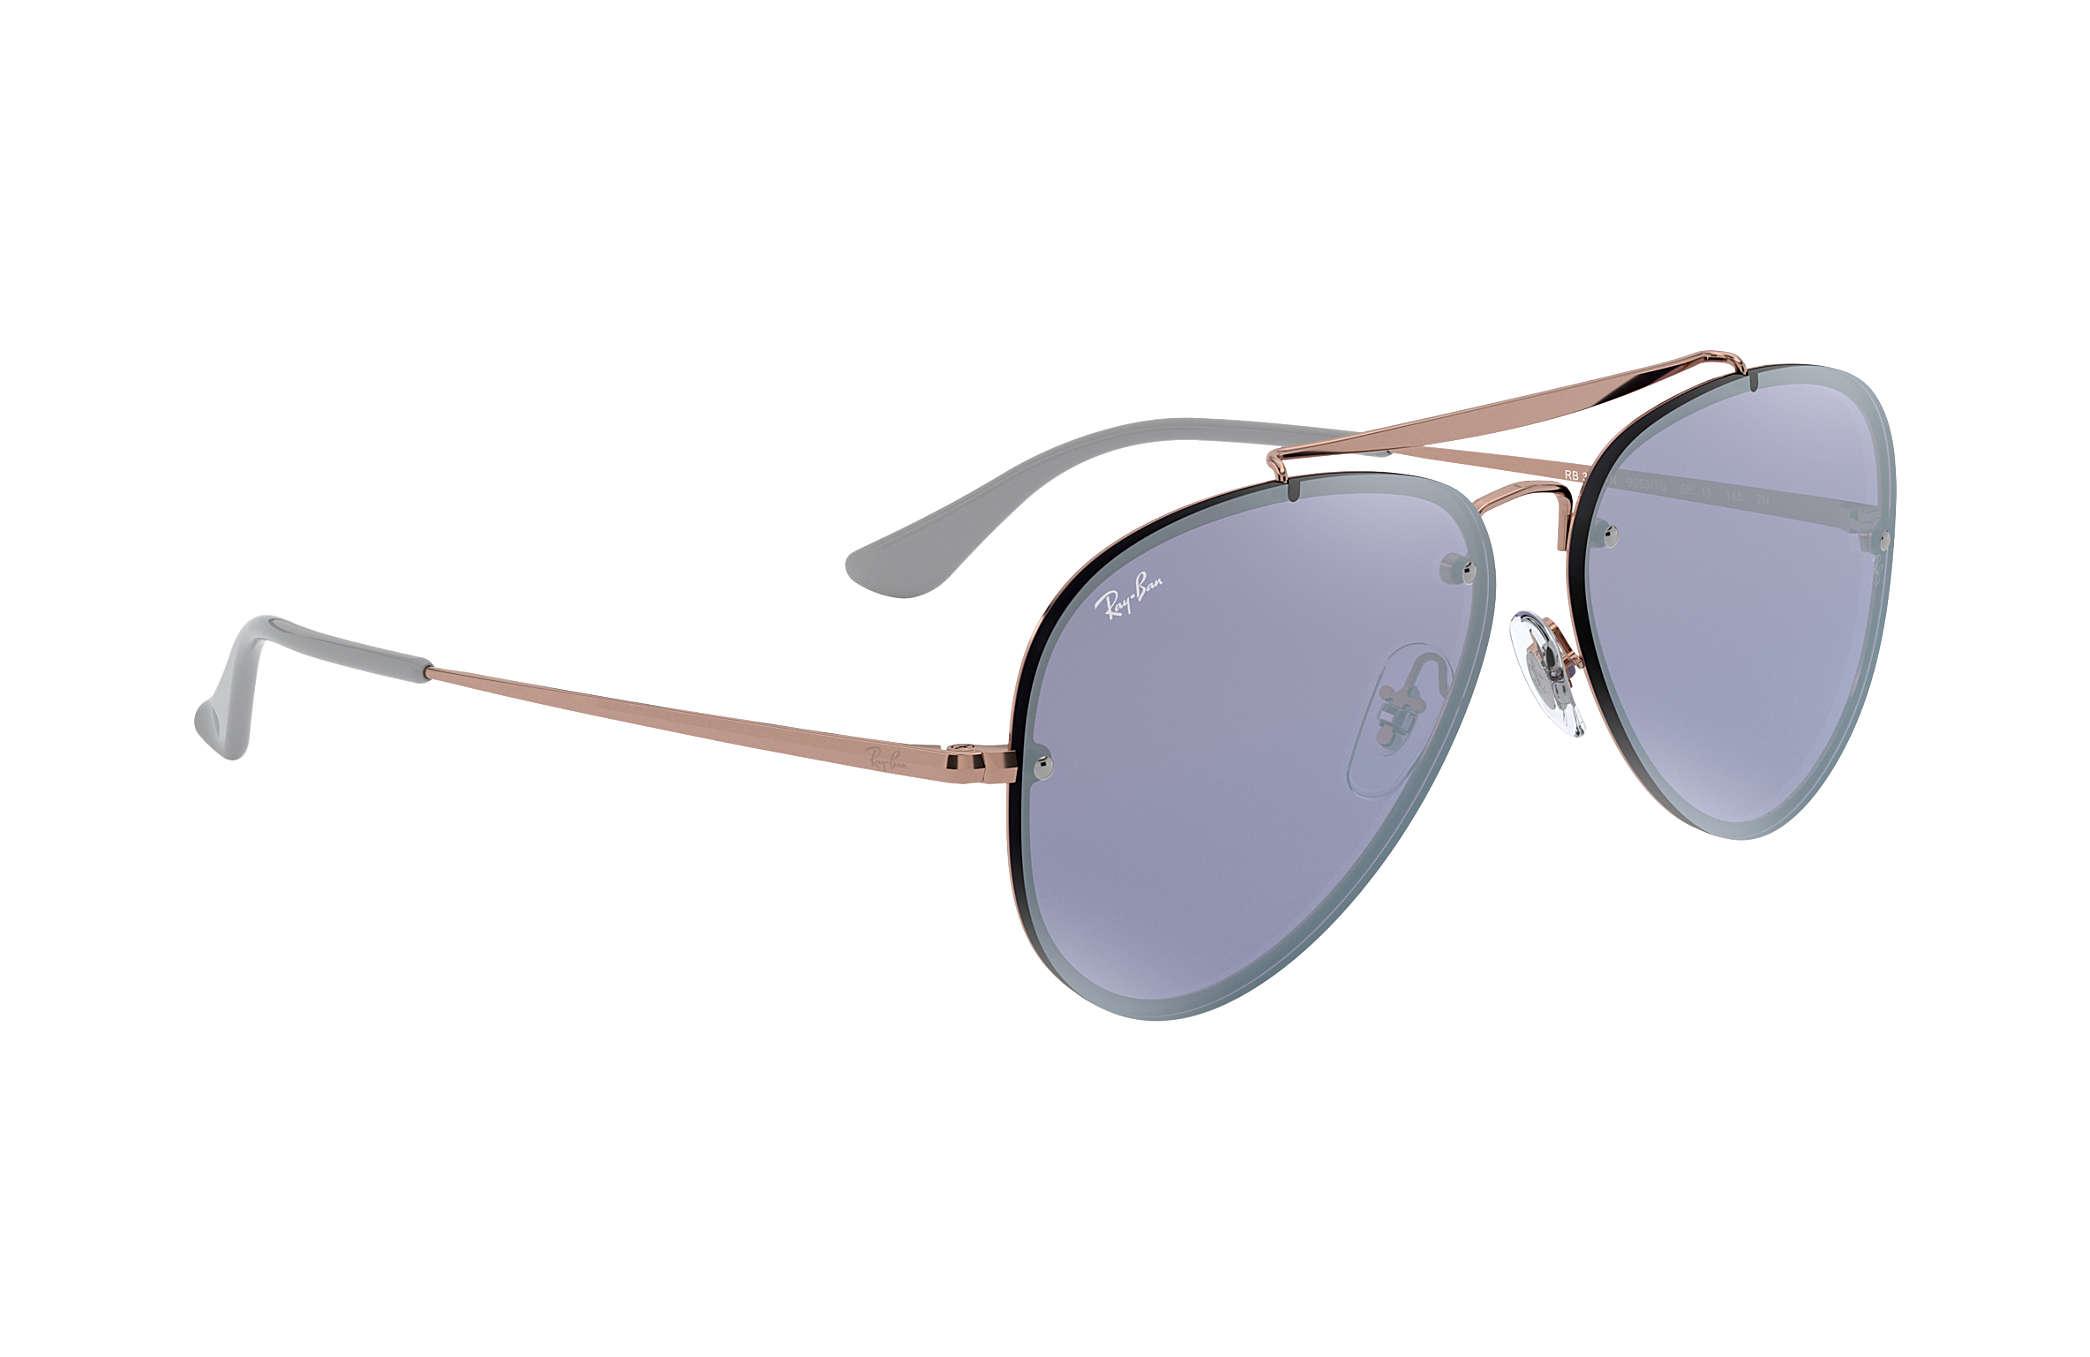 32010b850c Ray-Ban Blaze Aviator RB3584N Bronze-Copper - Steel - Violet Lenses ...